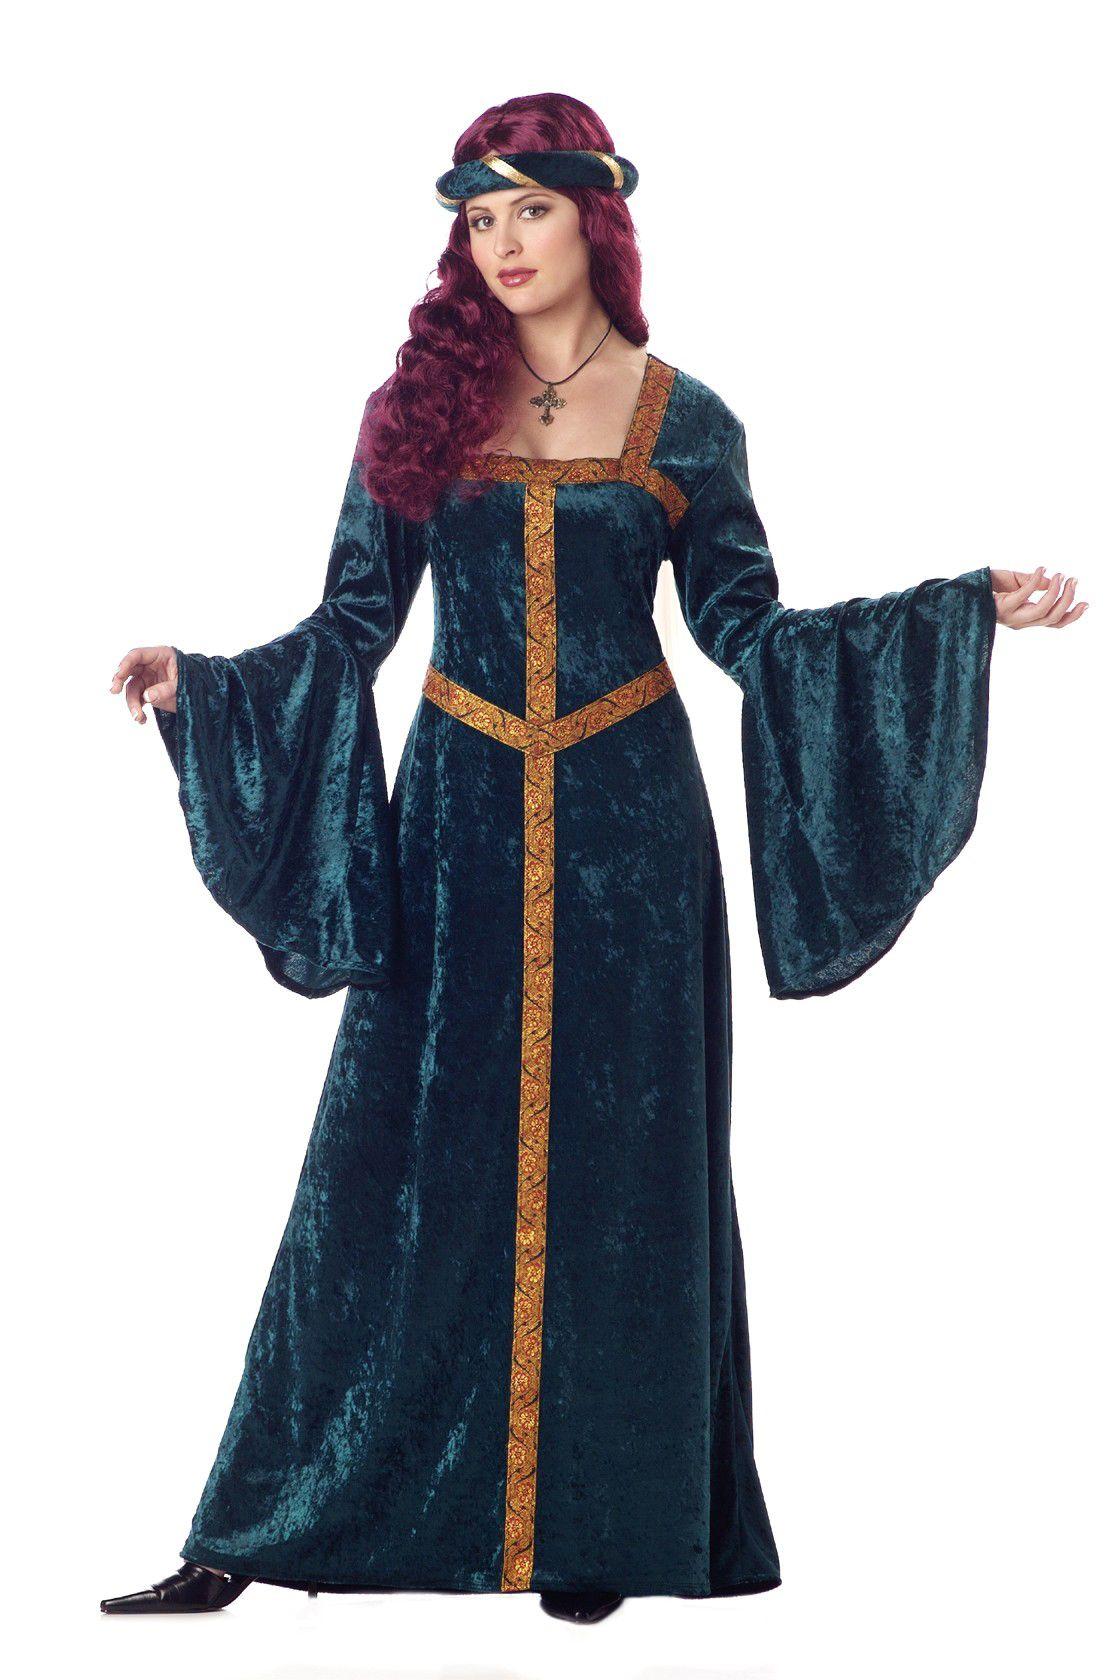 medieval costumes - Google Search   Children's Theatre The ...